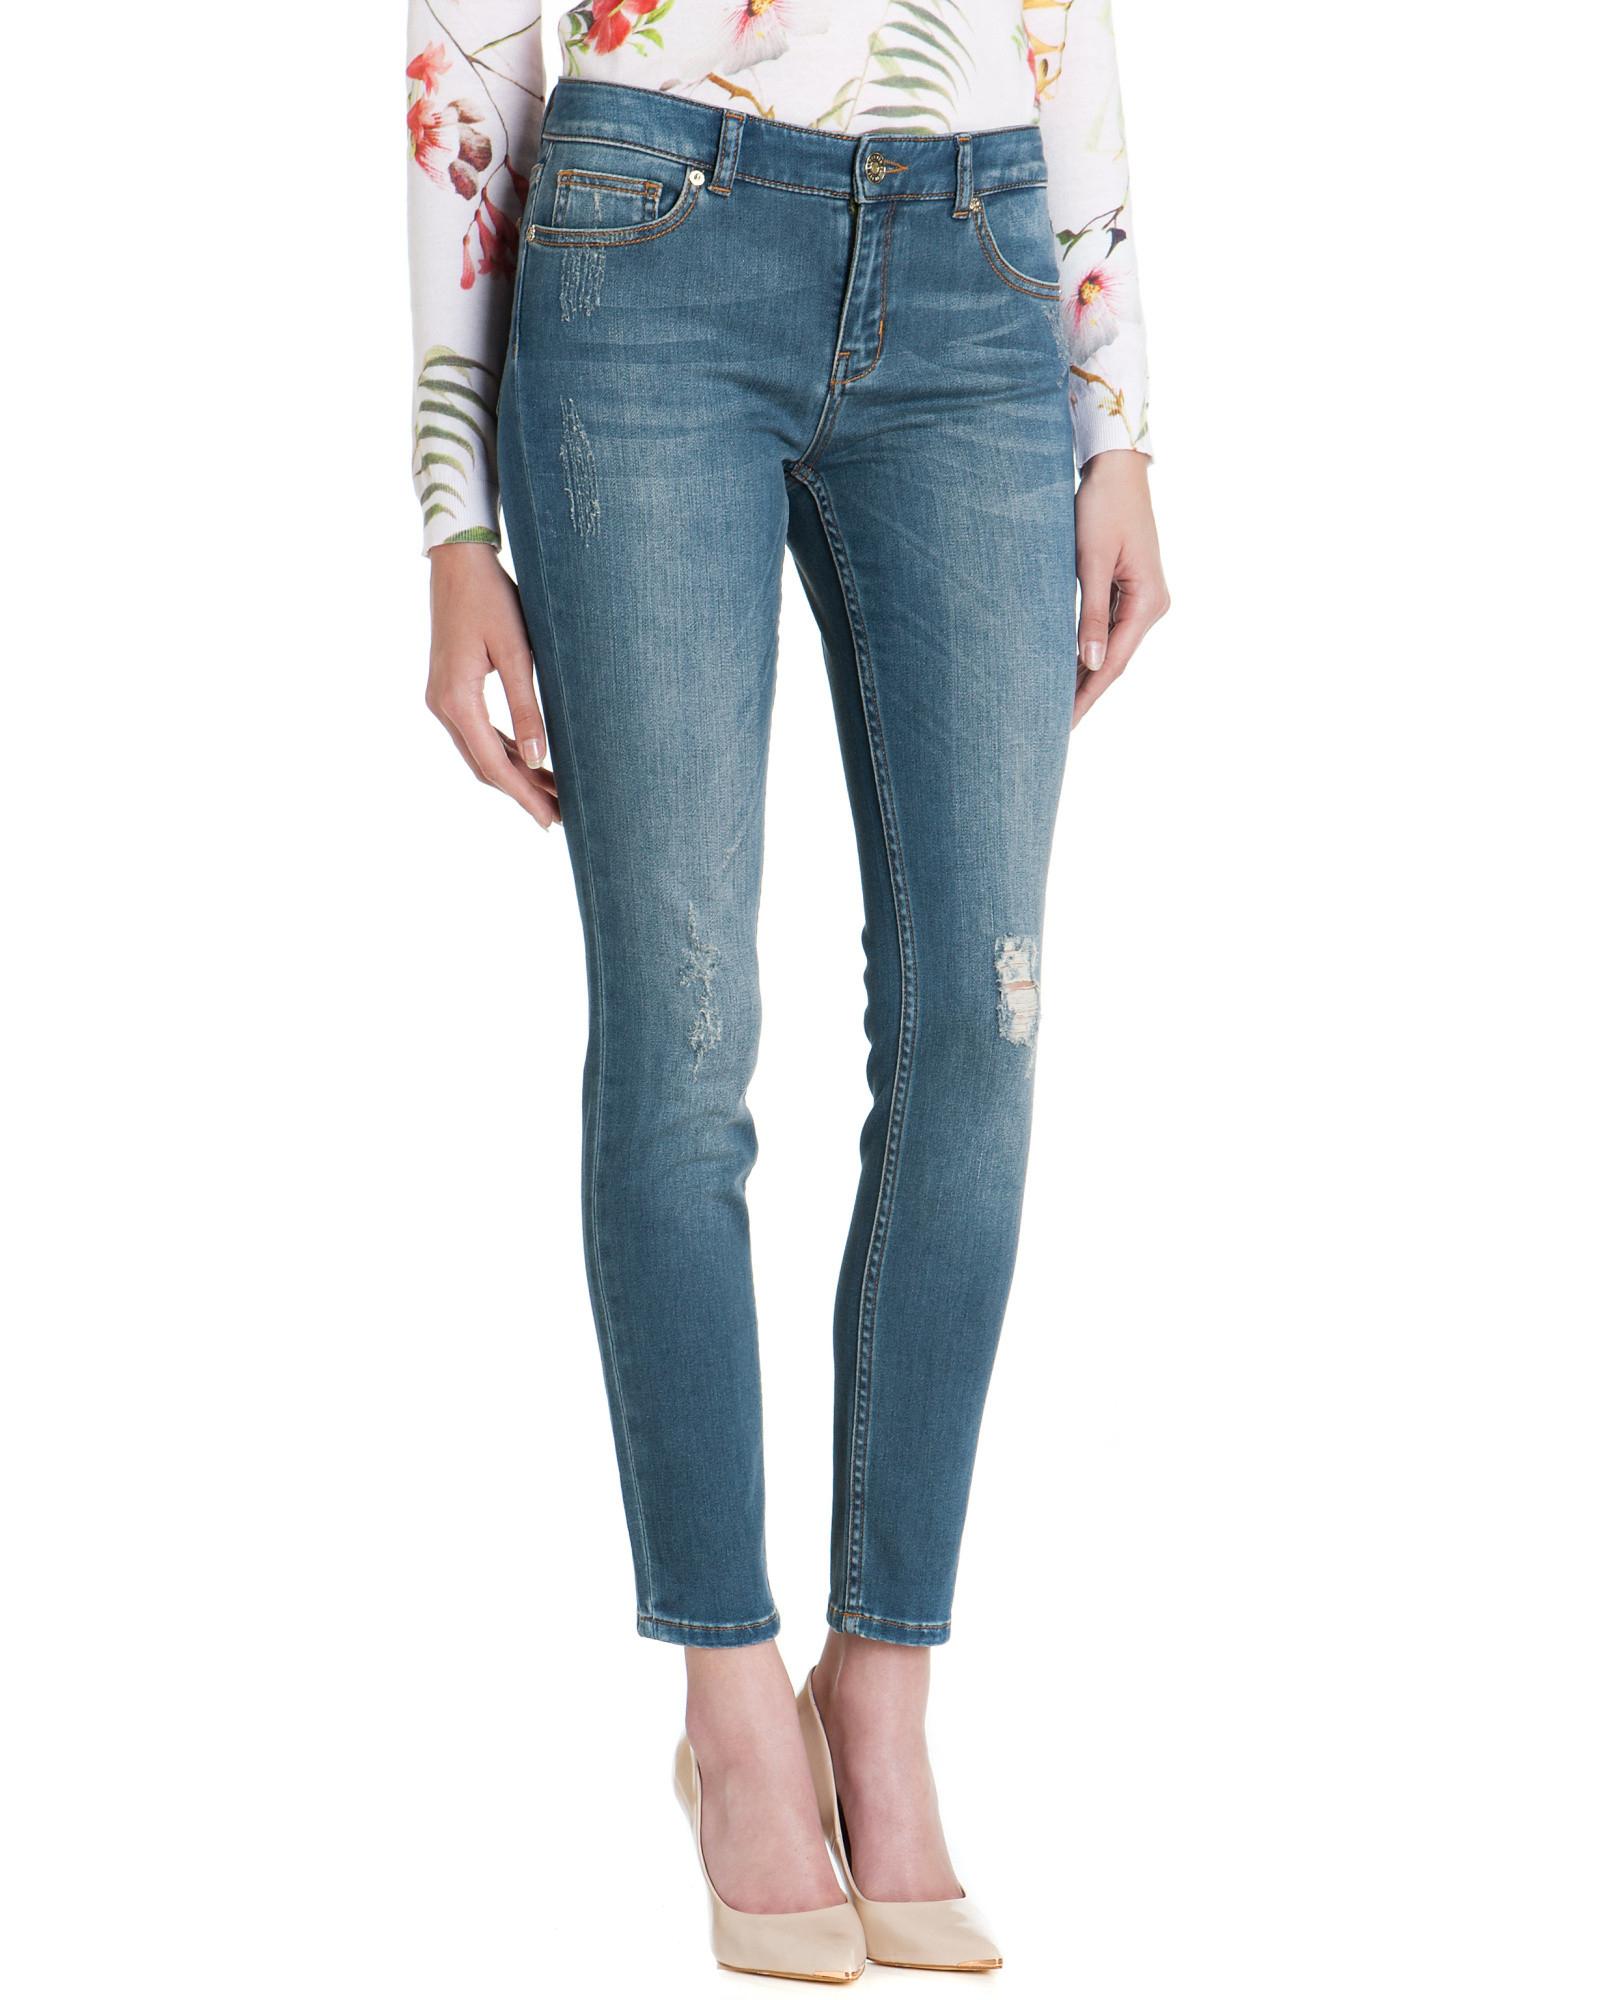 Ted Baker Denim Highje High Waisted Jeans in Light Wash (Blue)